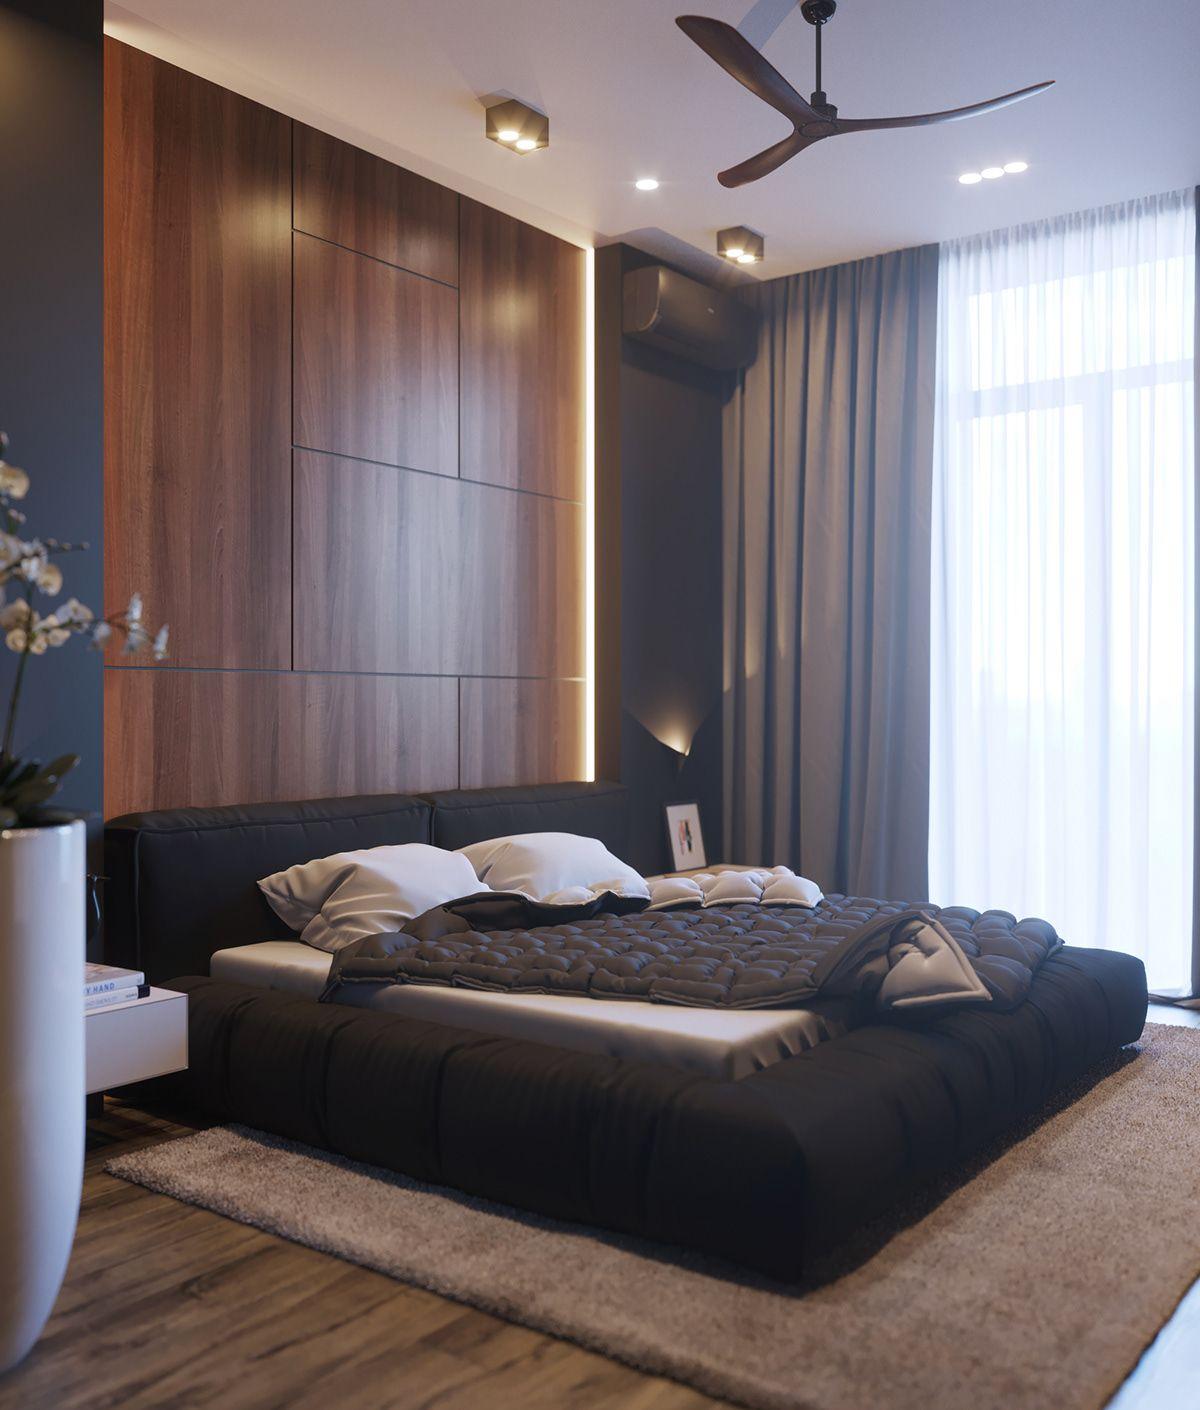 BLANC RESIDENCE on Behance   bedroom in 2019   Bedroom